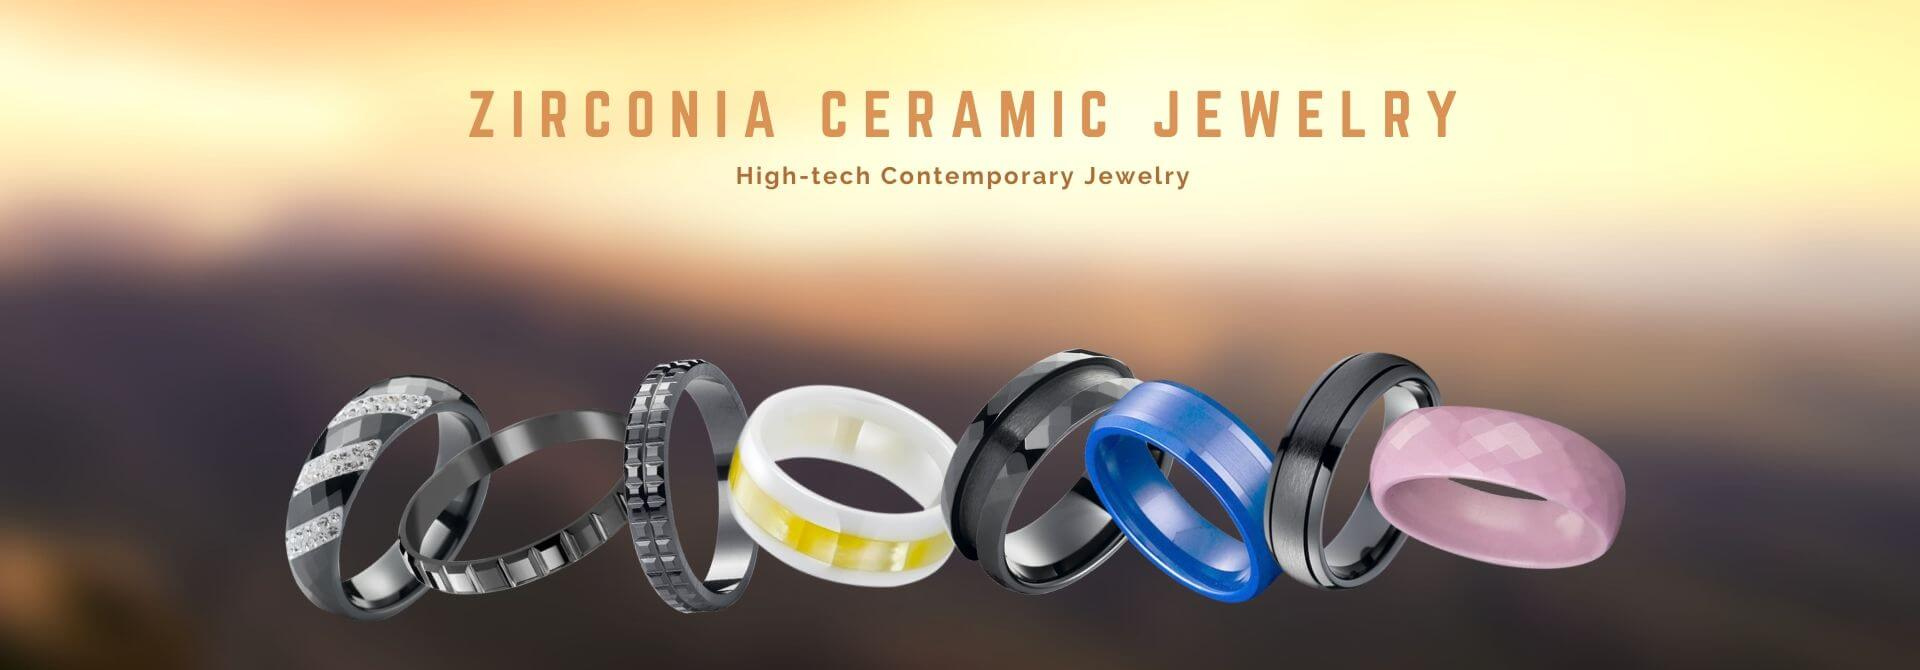 Shenzhen OEM & ODM Jewelry Manufacturer